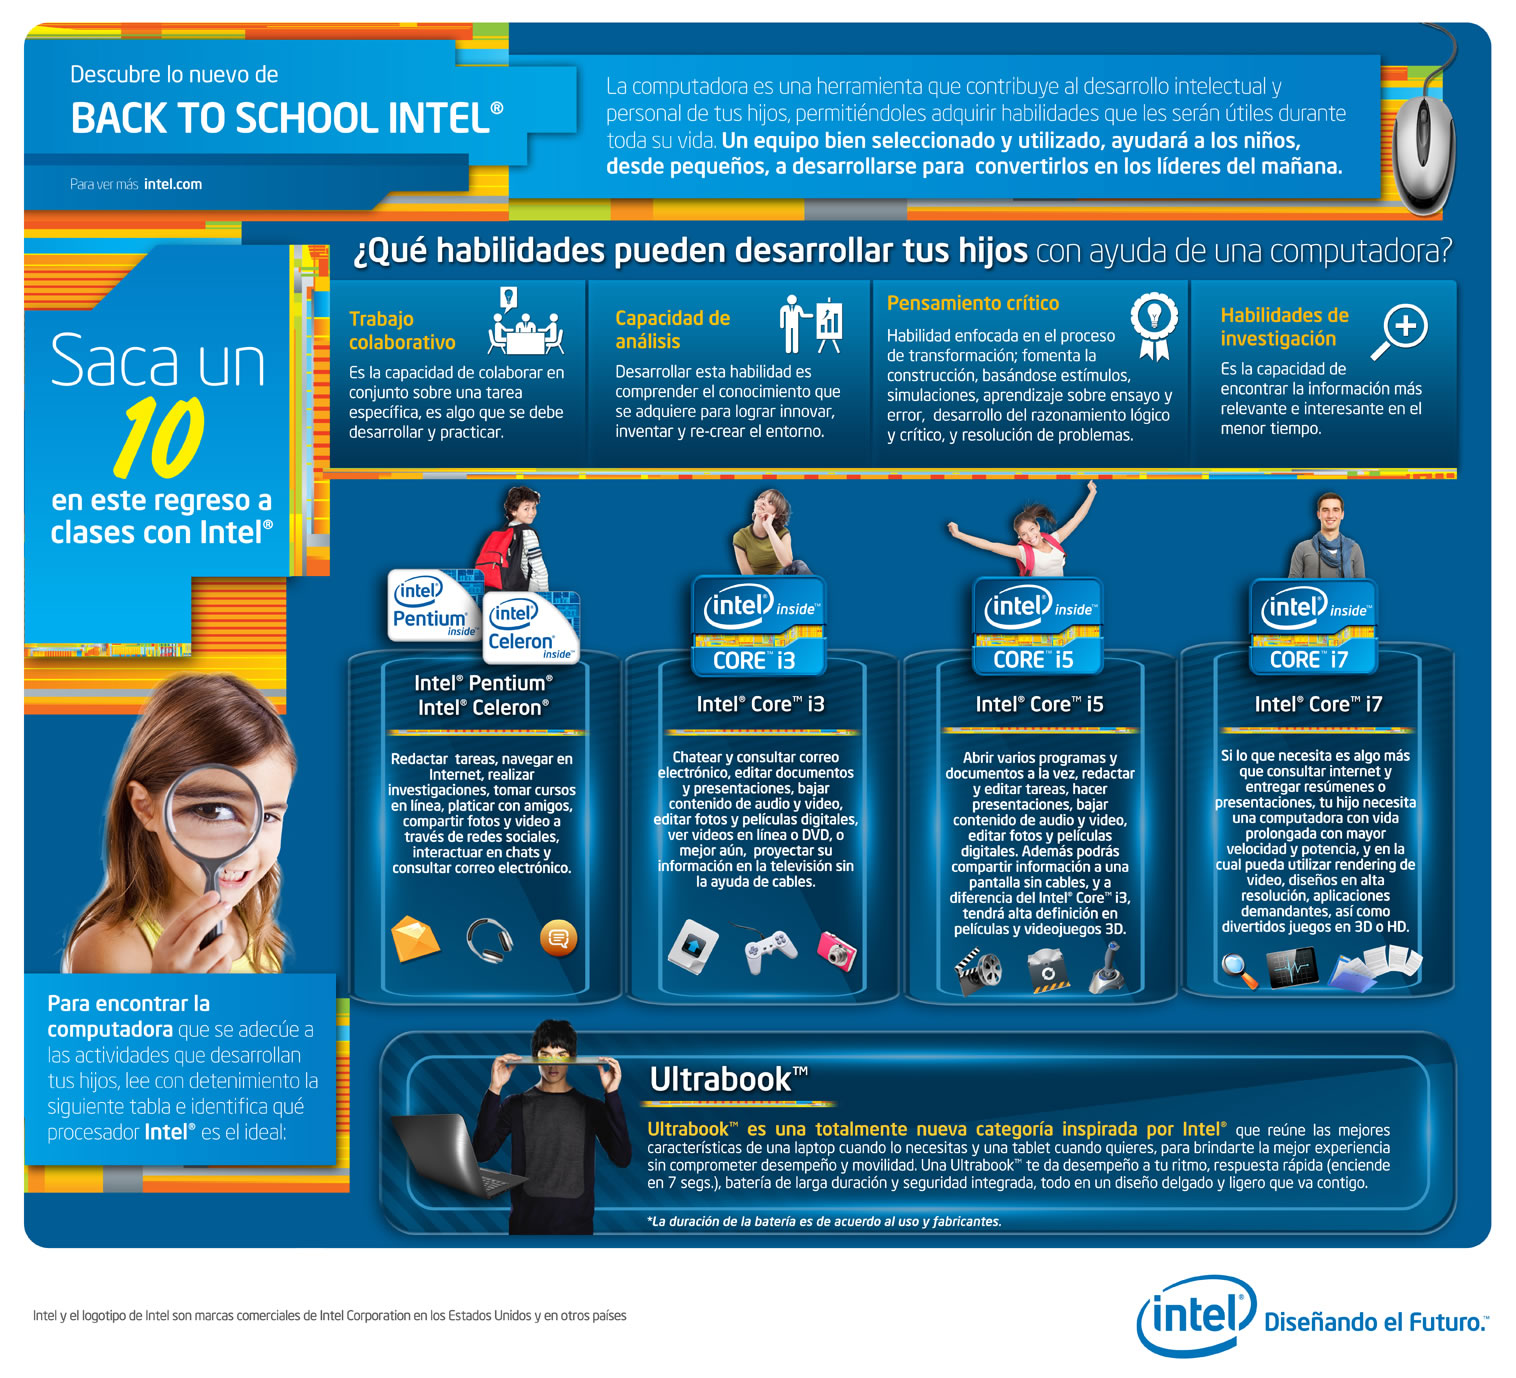 Infografia - Saca un 10 en este regreso a clases con Intel